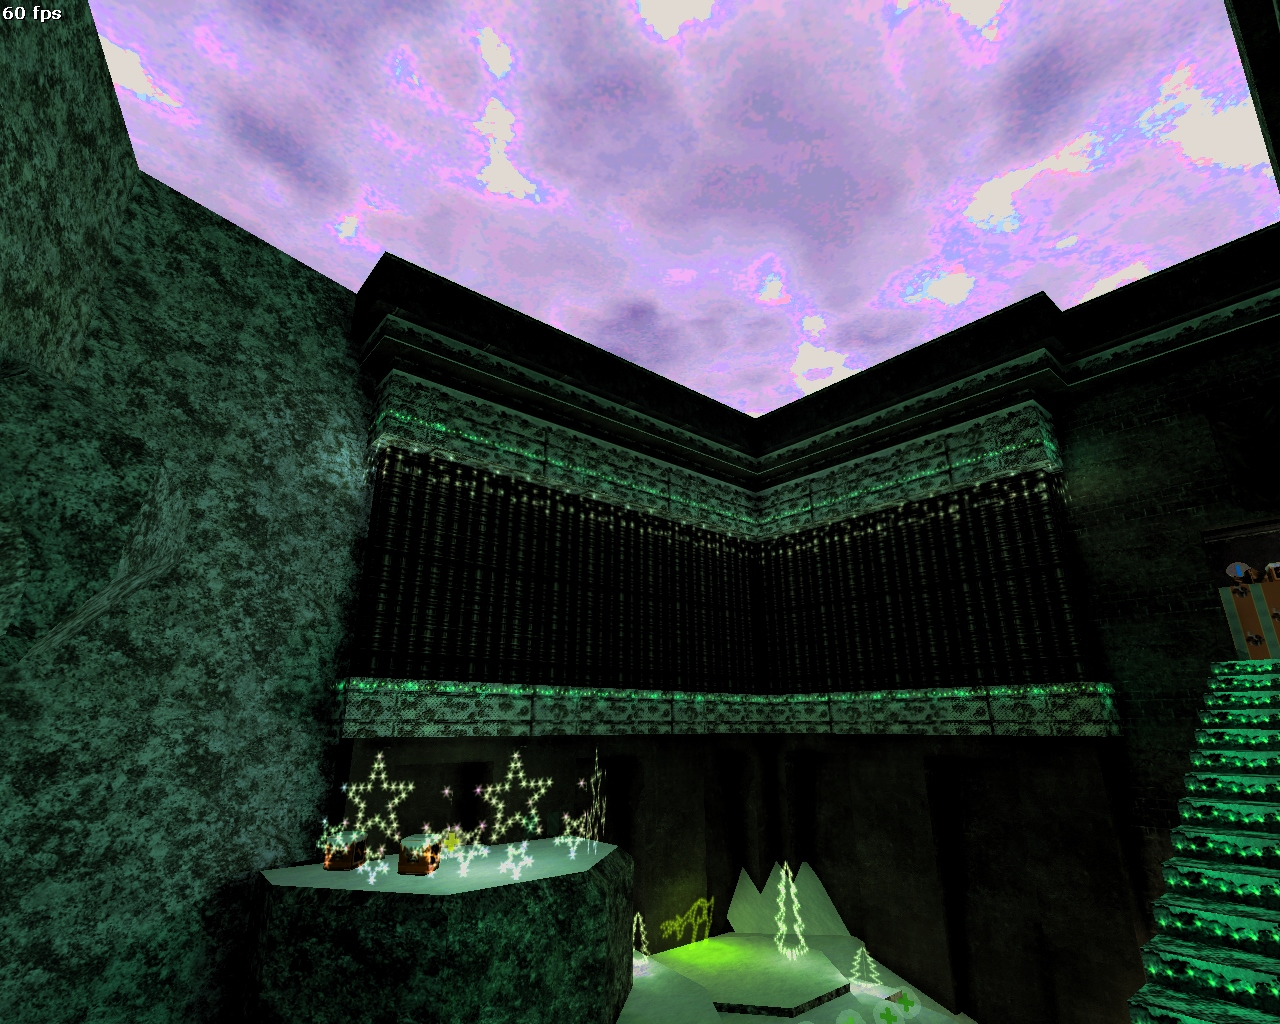 wintersedge0012.jpg - Half-Life